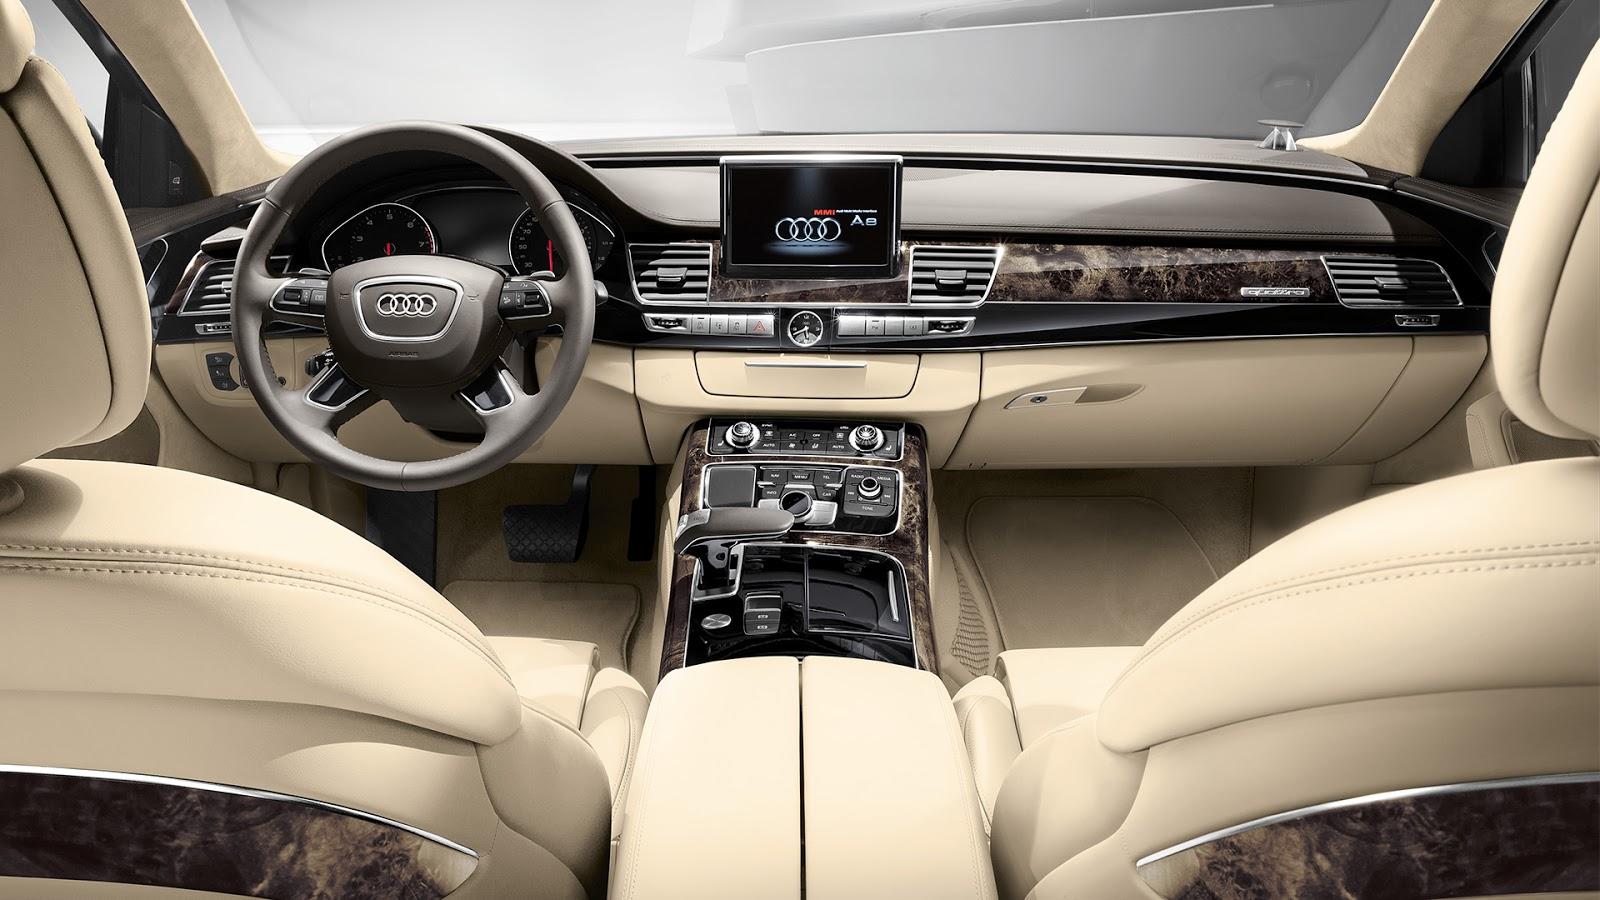 AUDI A8 Vs BMW 7SERIES MERCEDES BENZ S CLASS LUXURY SEDAN